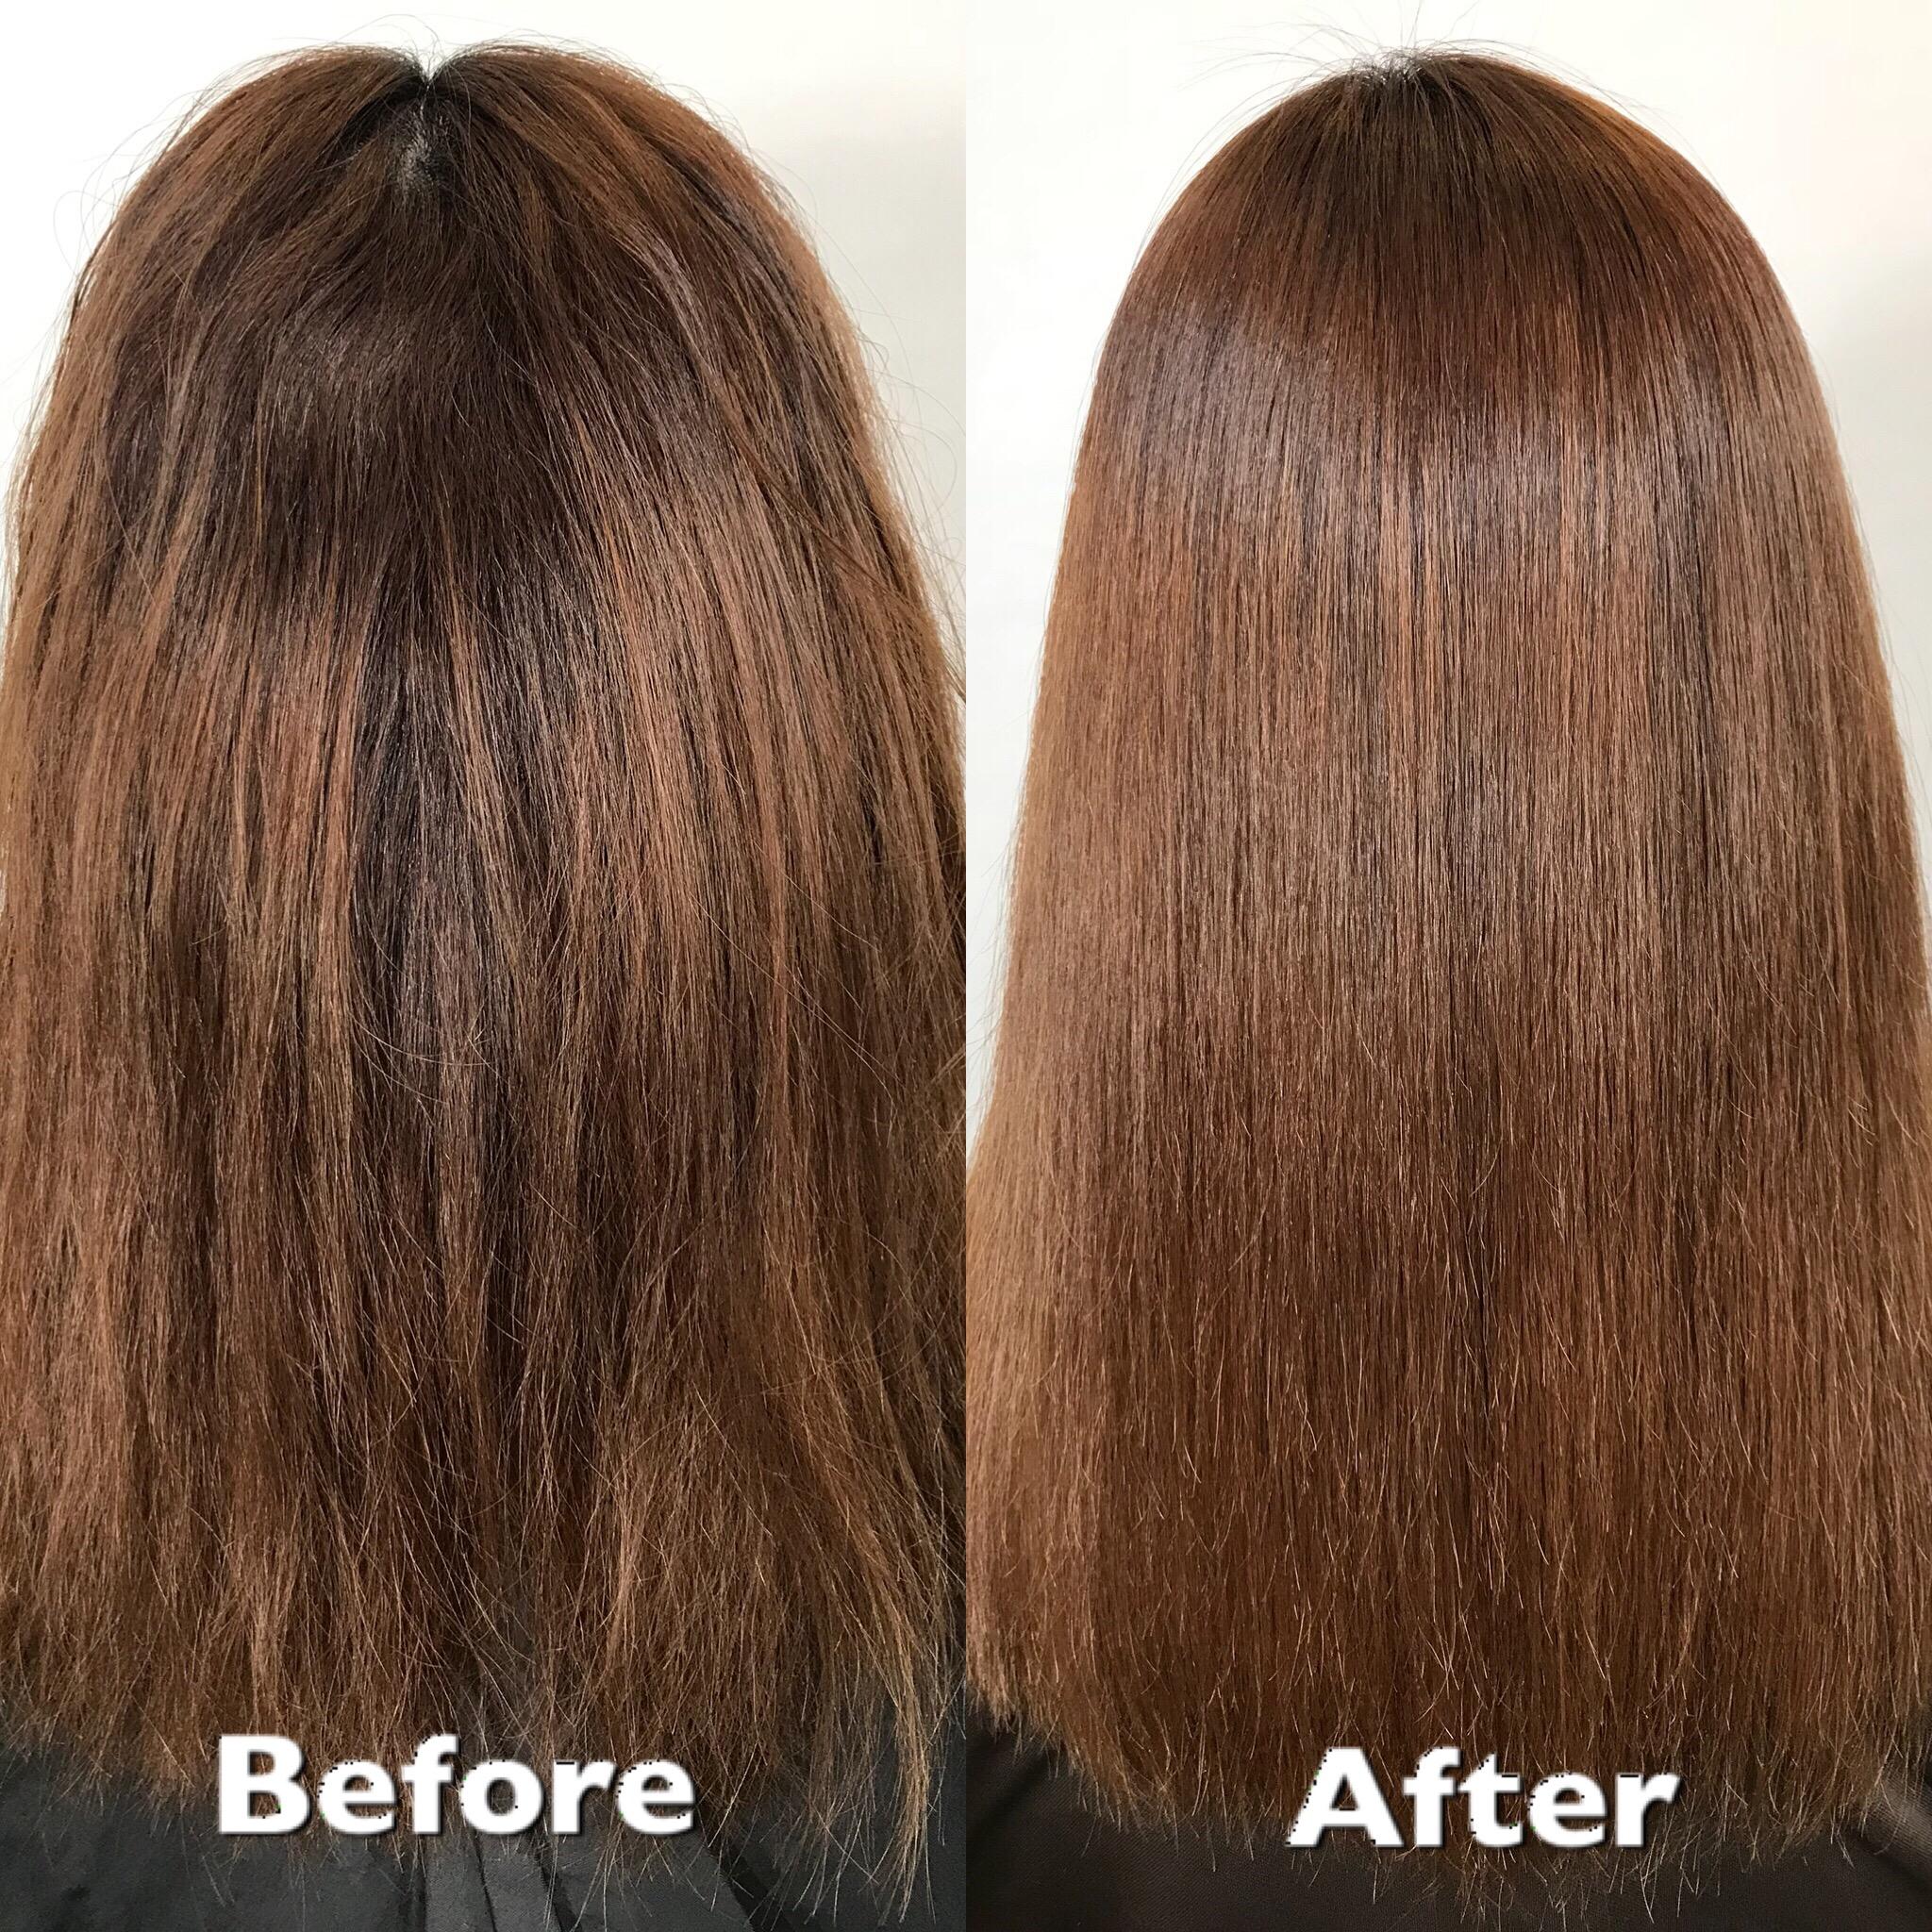 髪質改善 縮毛矯正 銀座 ツヤ髪